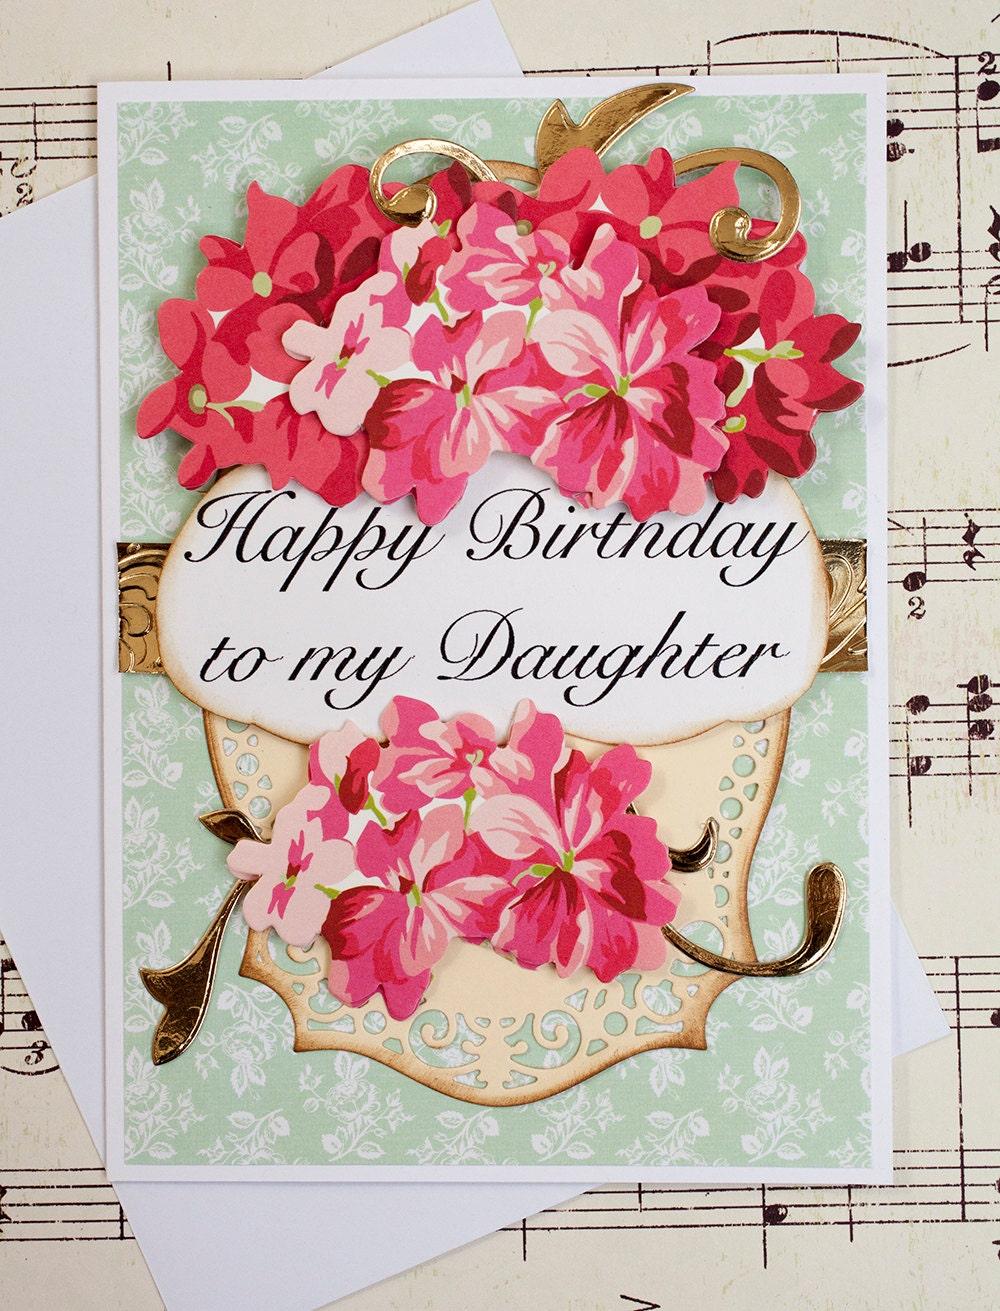 Daughter birthday card 3d birthday greeting card blank card zoom kristyandbryce Choice Image